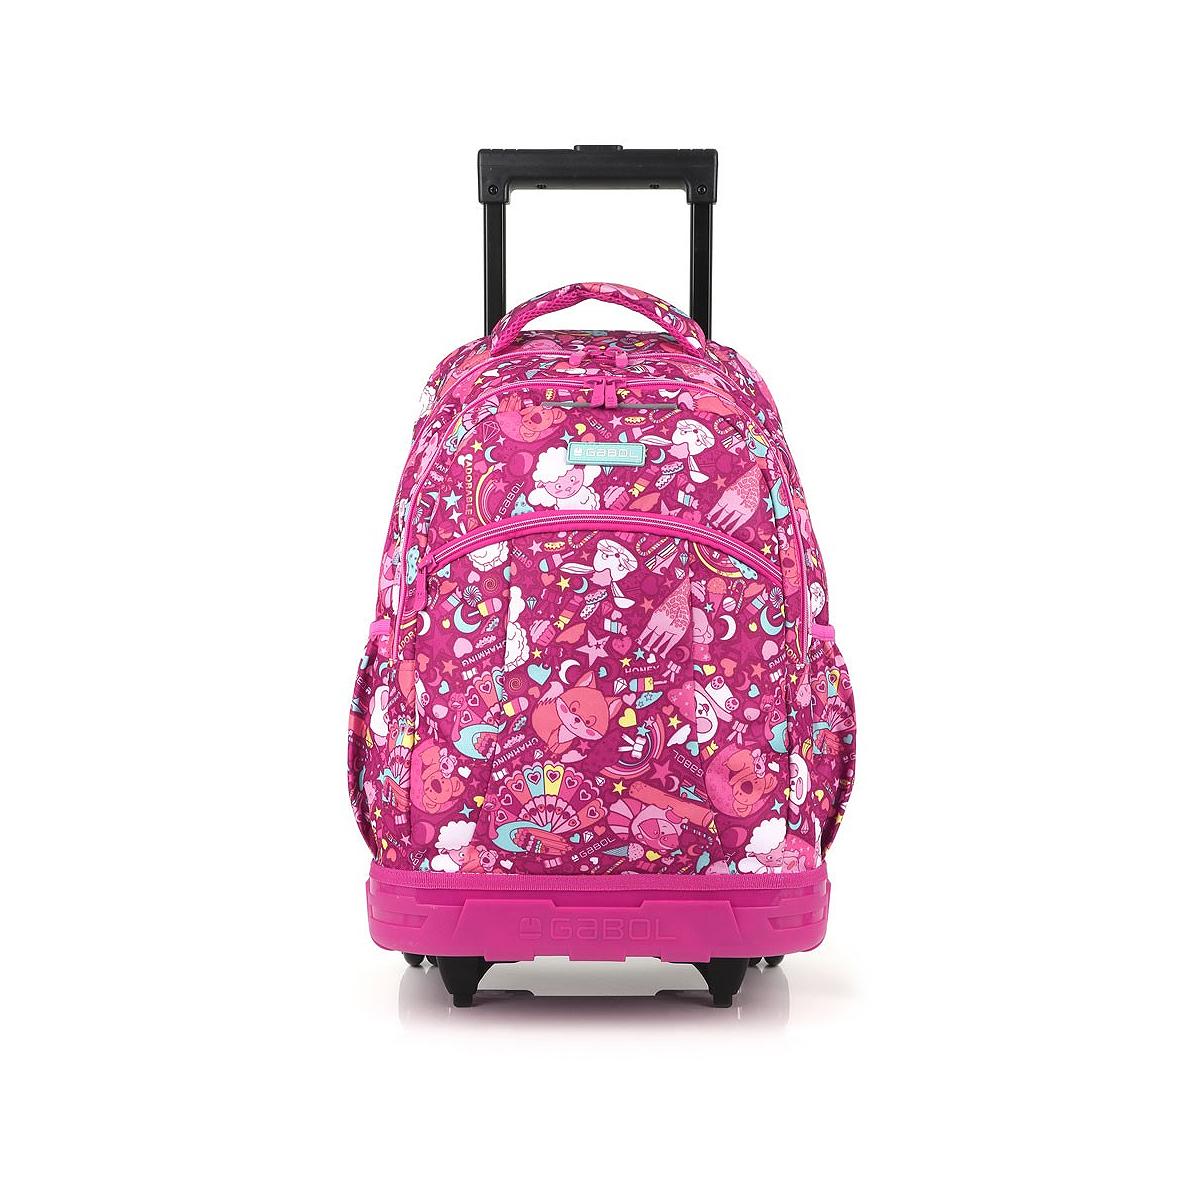 Ghiozdan Troller, Două Compartimente, Roz, Model Toy, Gabol, 224447